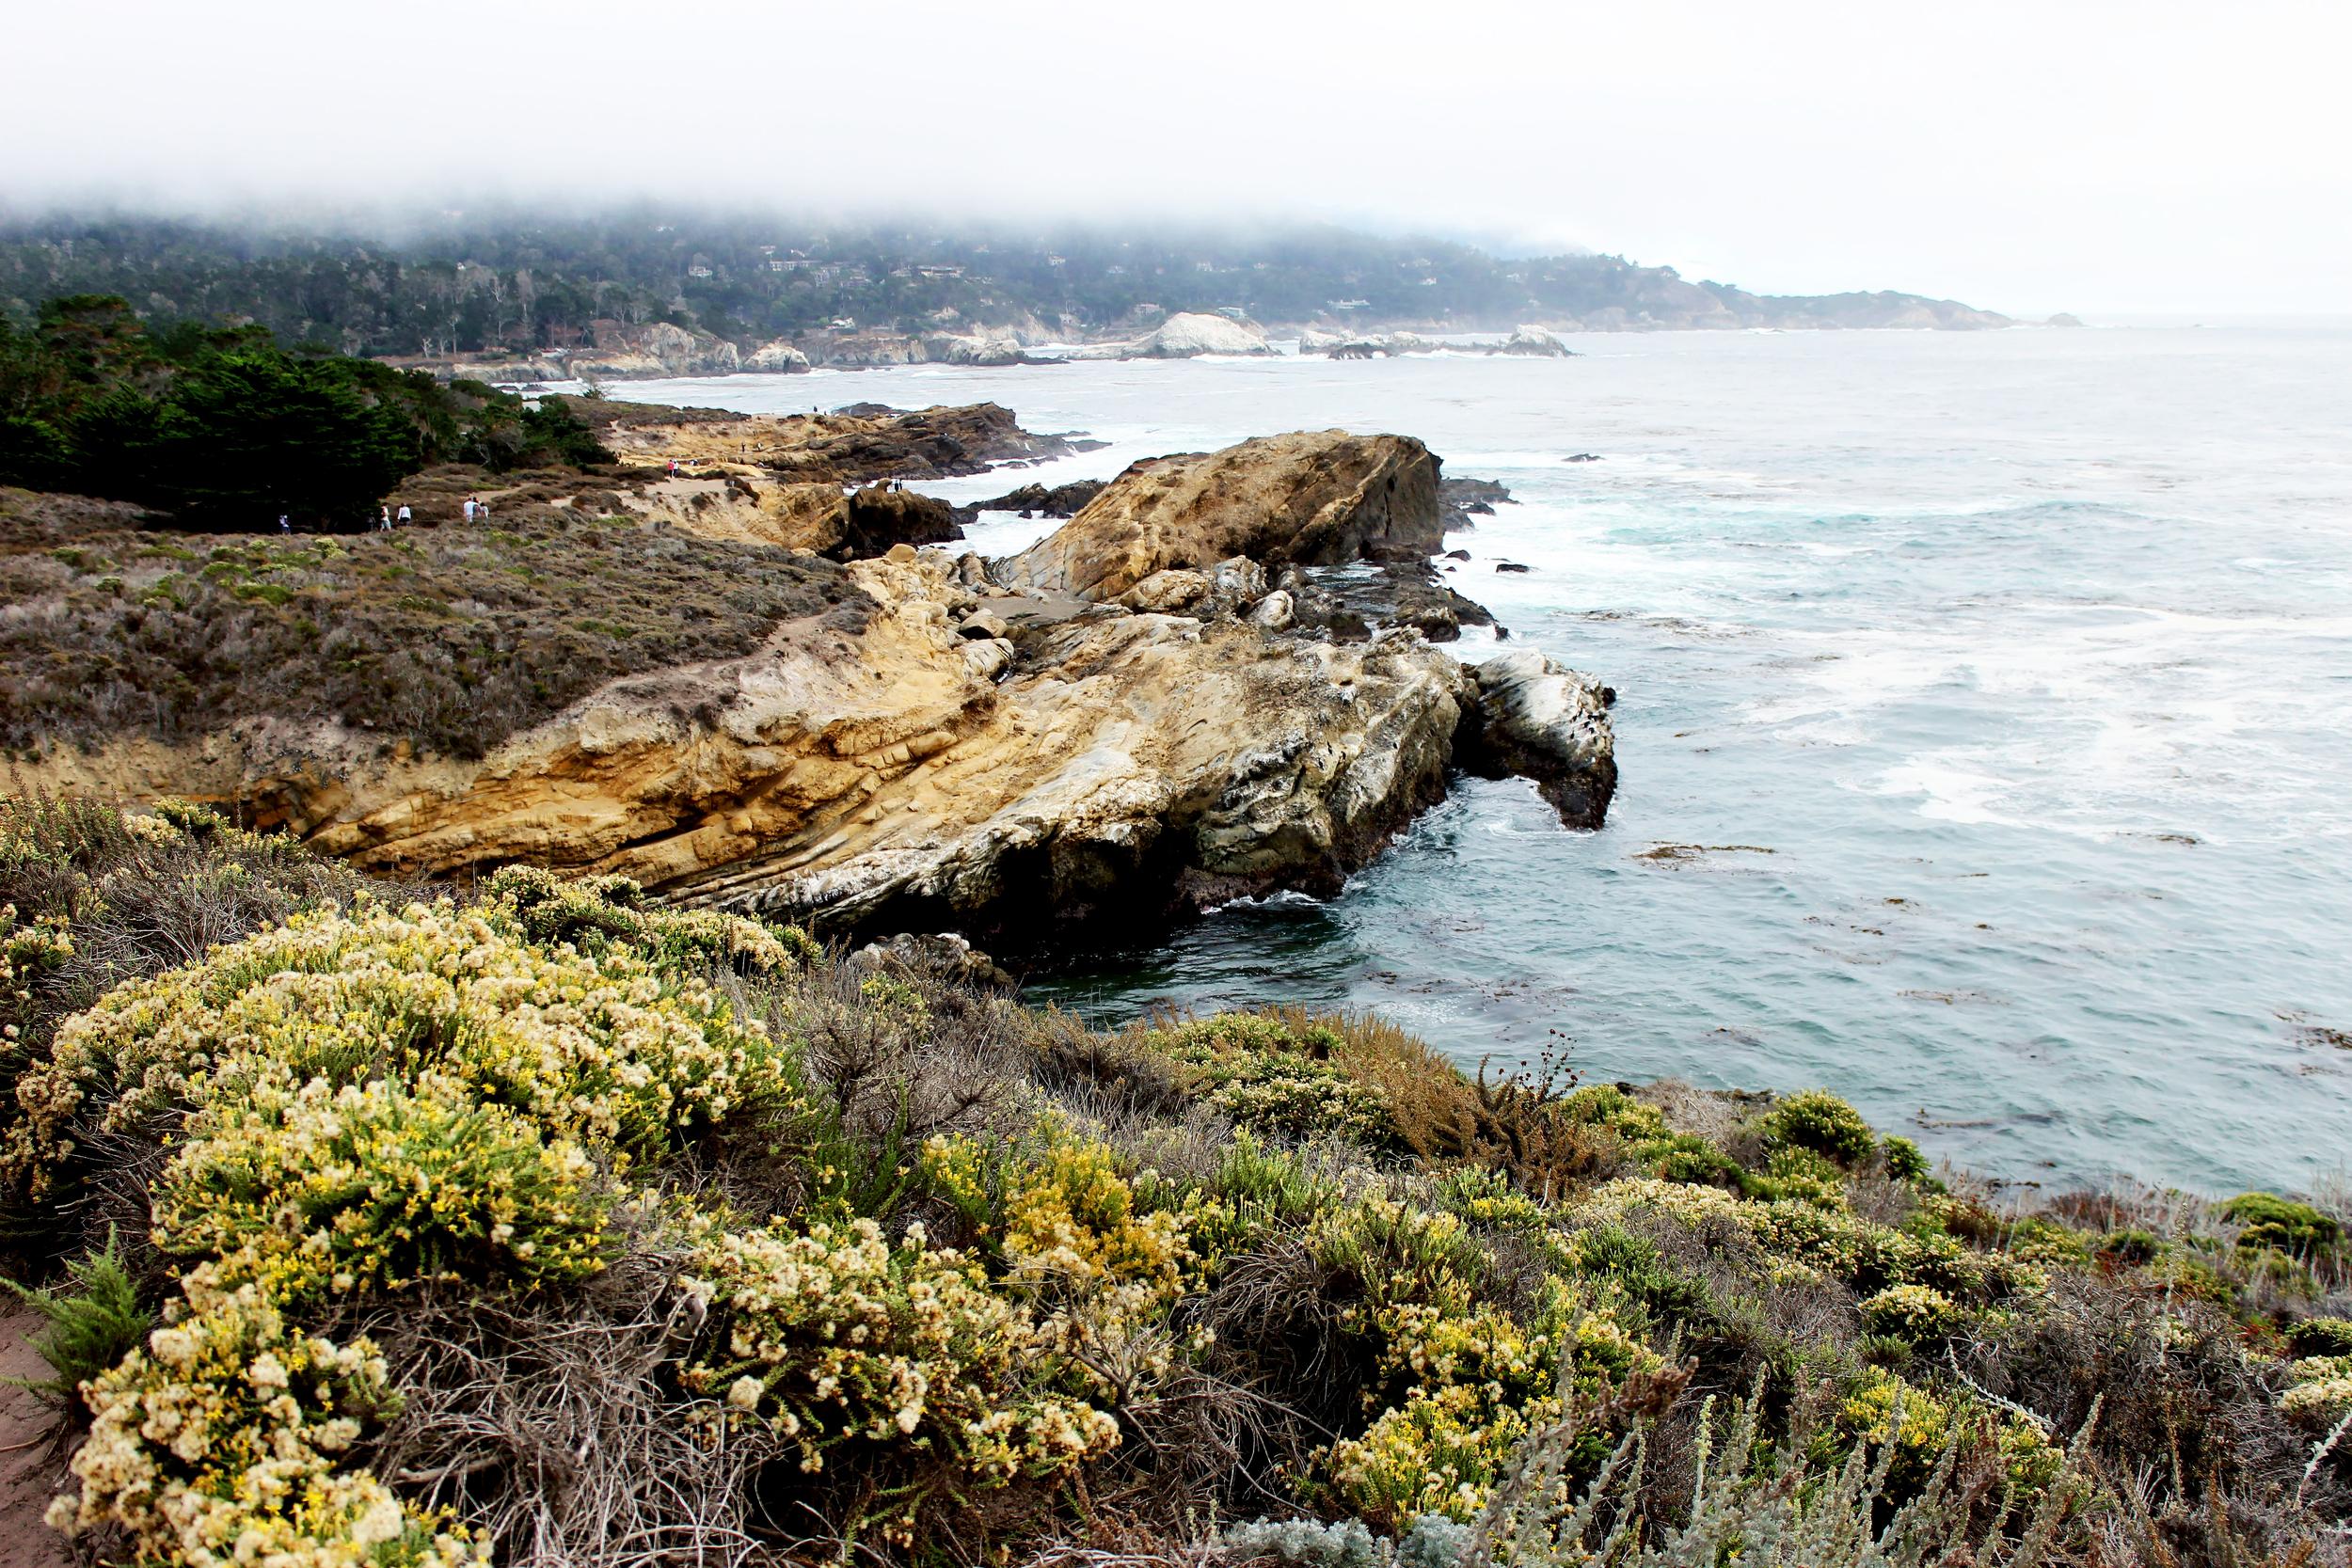 Point Lobos, Monterey Bay